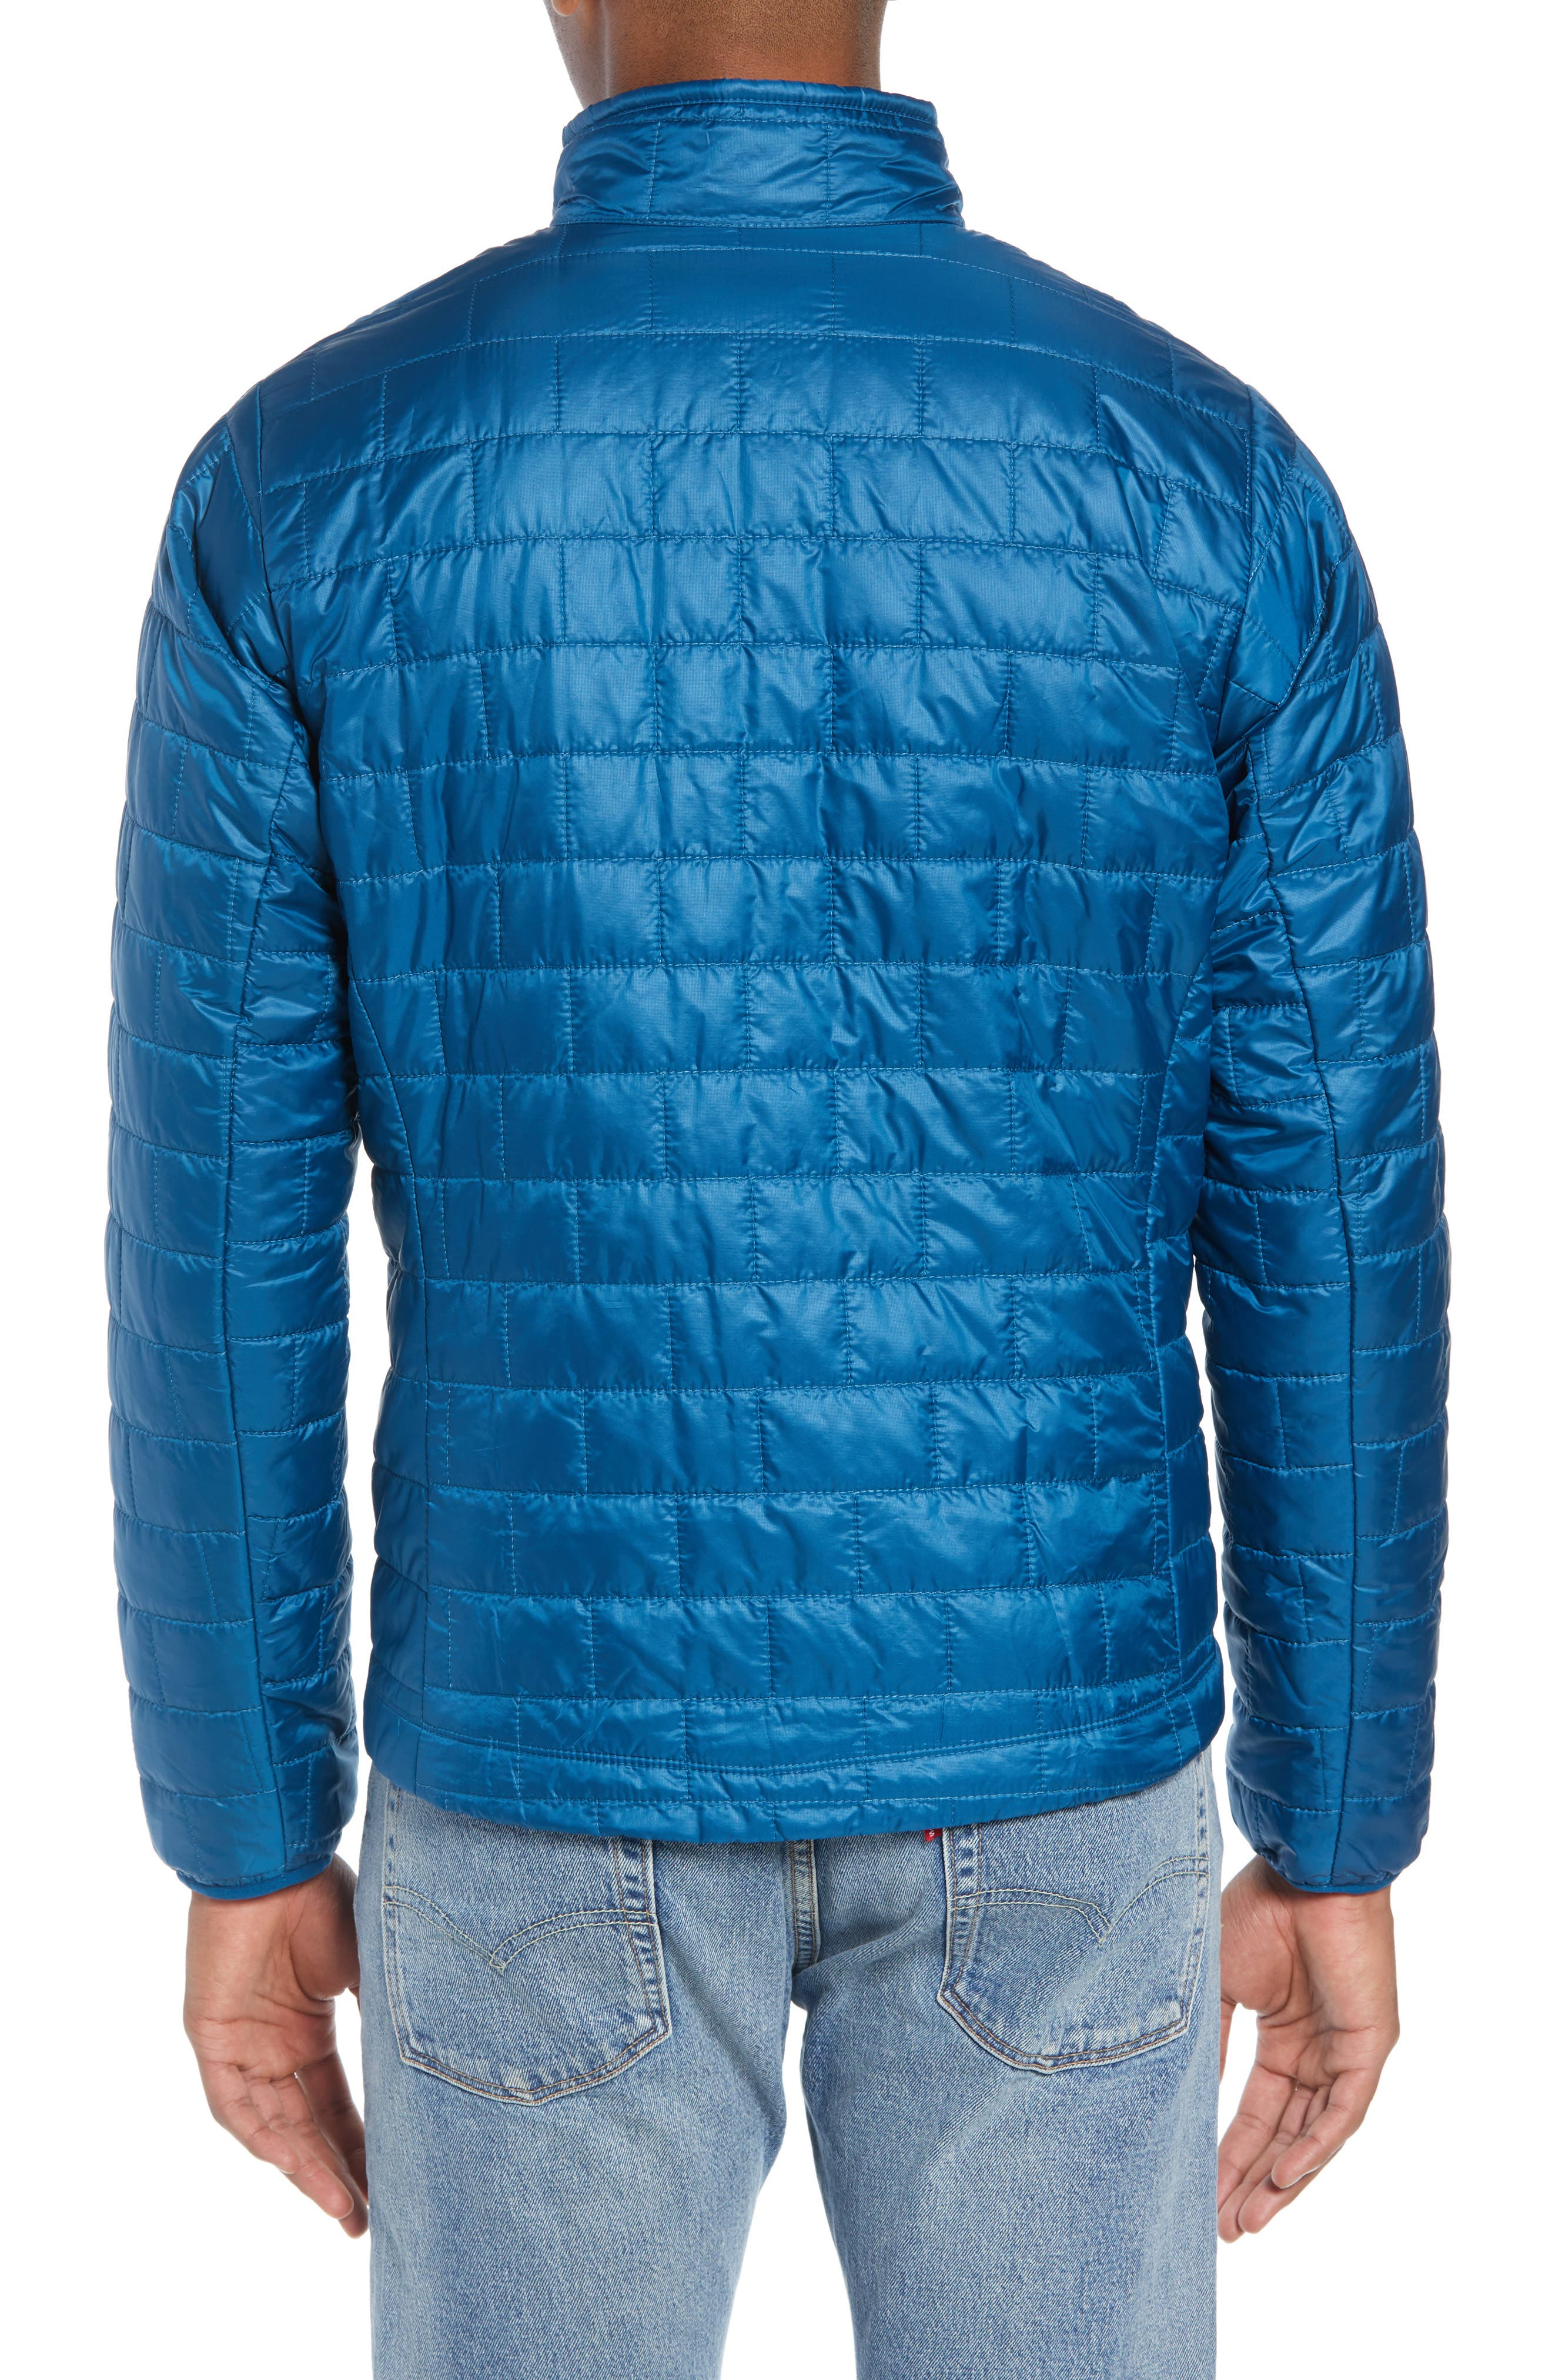 PATAGONIA,                             'Nano Puff<sup>®</sup>' Water Resistant Jacket,                             Alternate thumbnail 2, color,                             BIG SUR BLUE W/ BALKAN BLUE